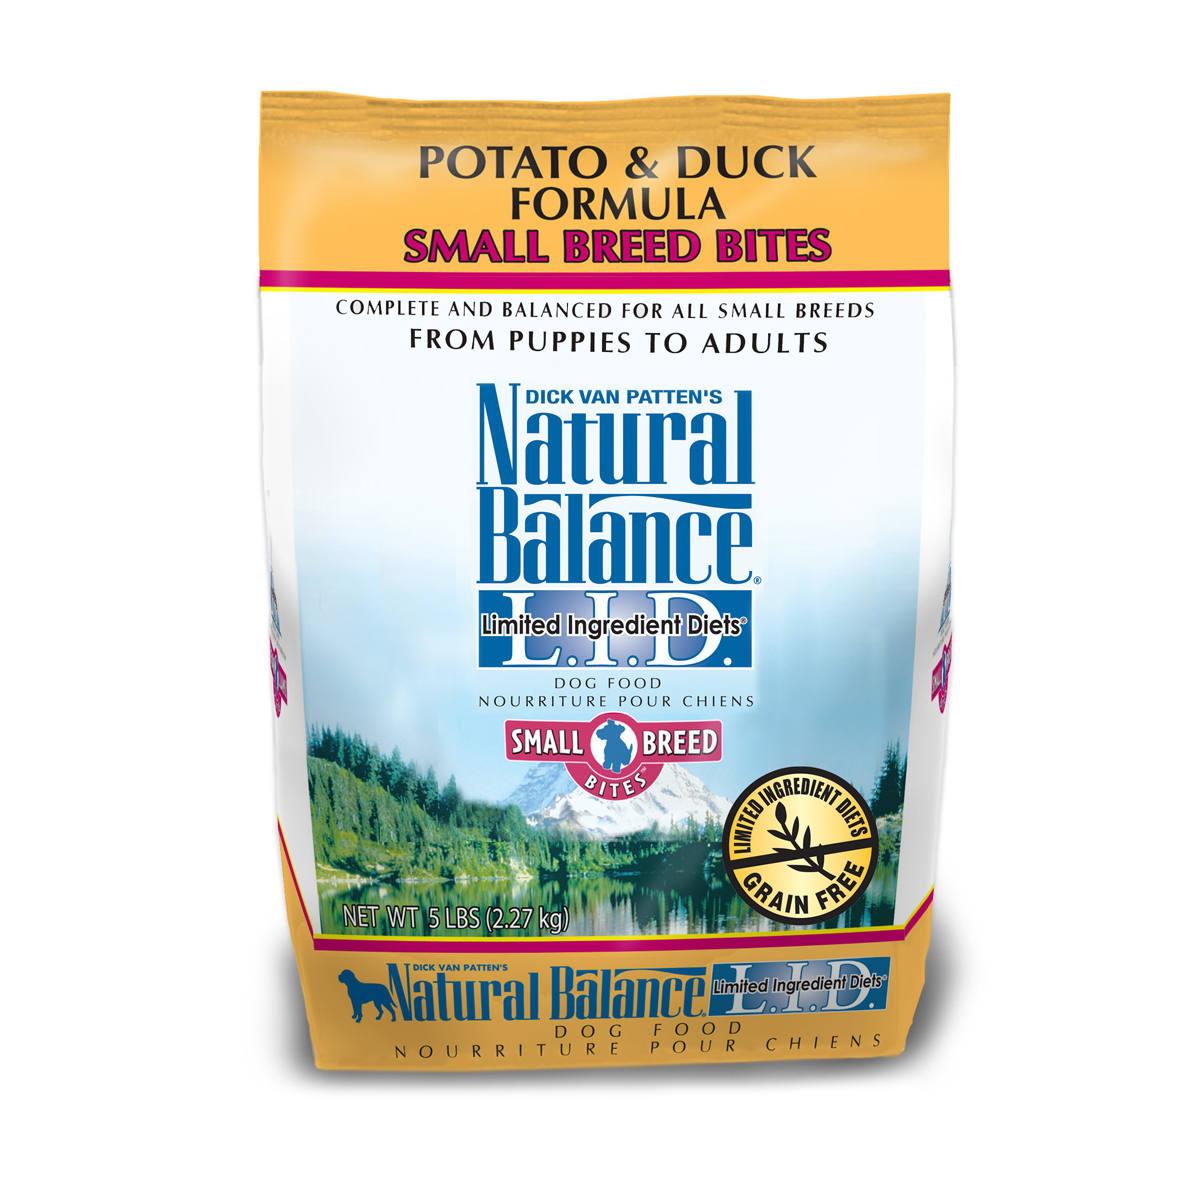 All Natural Urinary Tract Dog Food